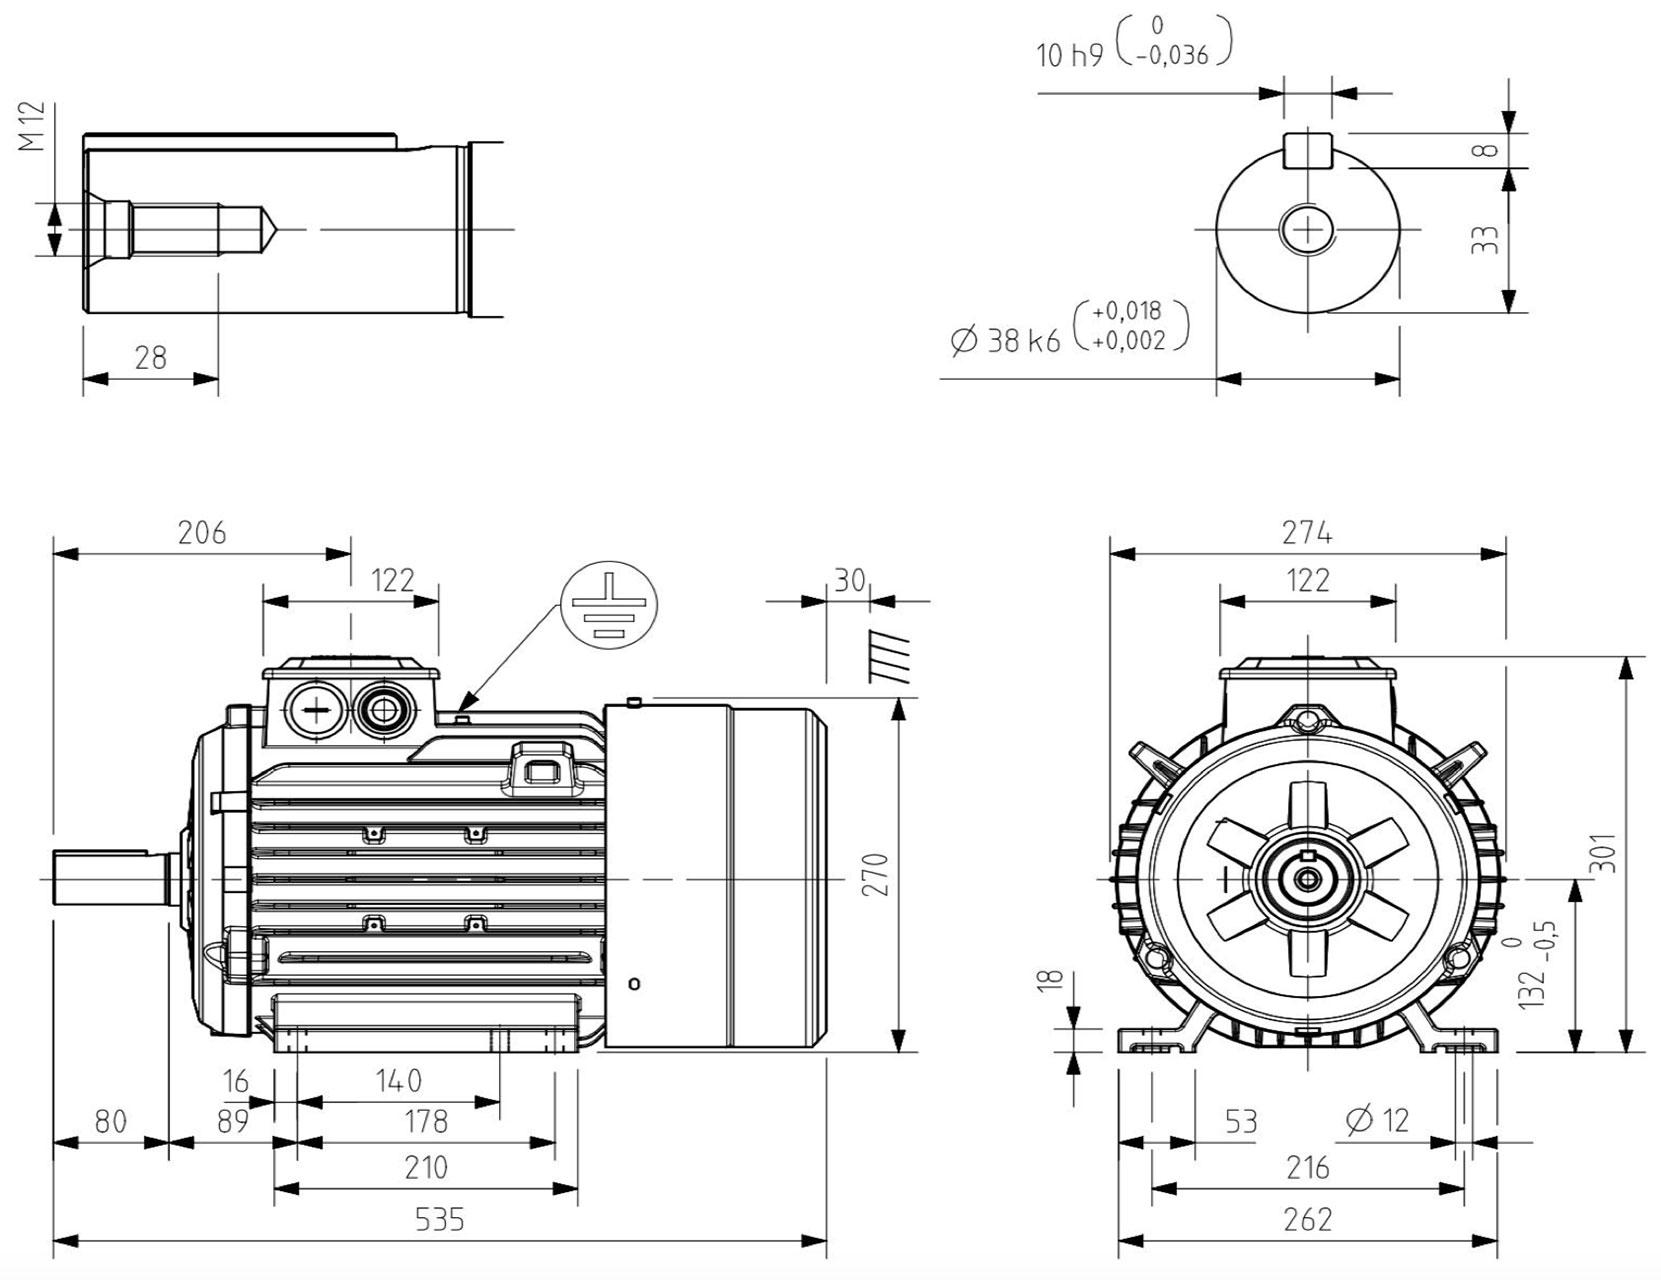 moteur triphas u00e9 7 5 kw  1500 tr  min  b3  400  690v